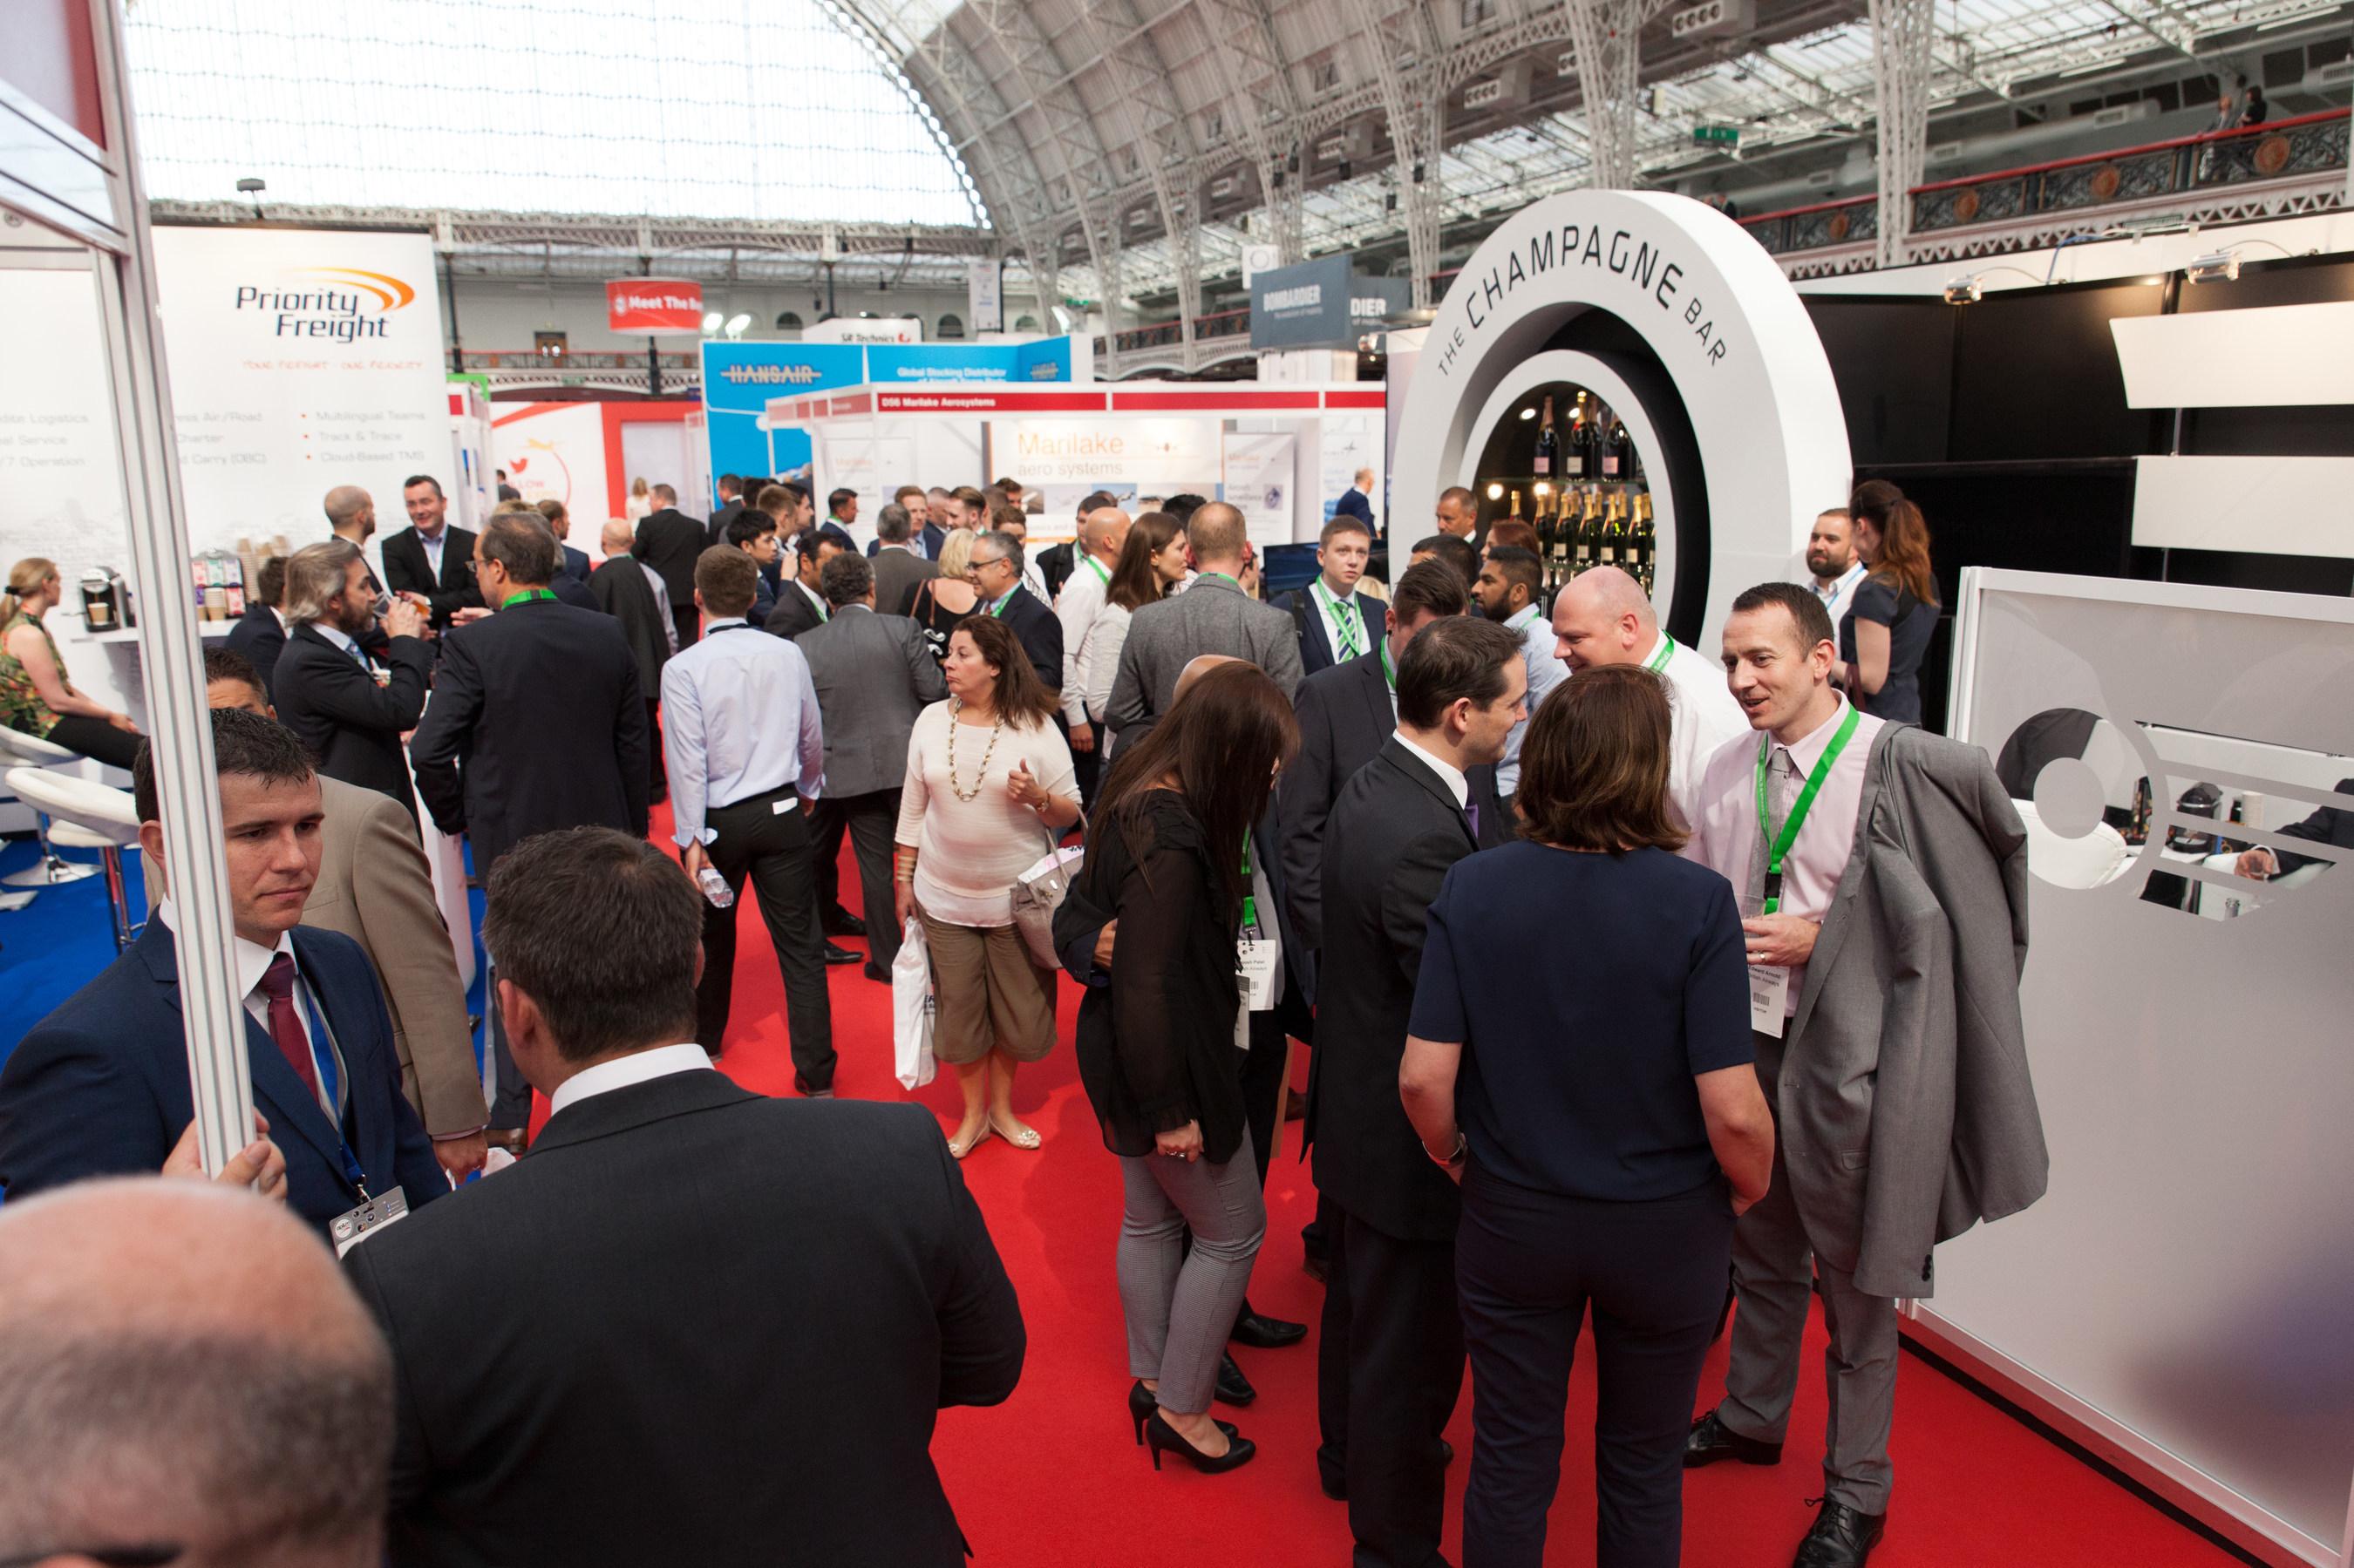 Penton's MRO Network to Host ap&m Europe, the Global MRO Procurement Expo, June 2016 in London